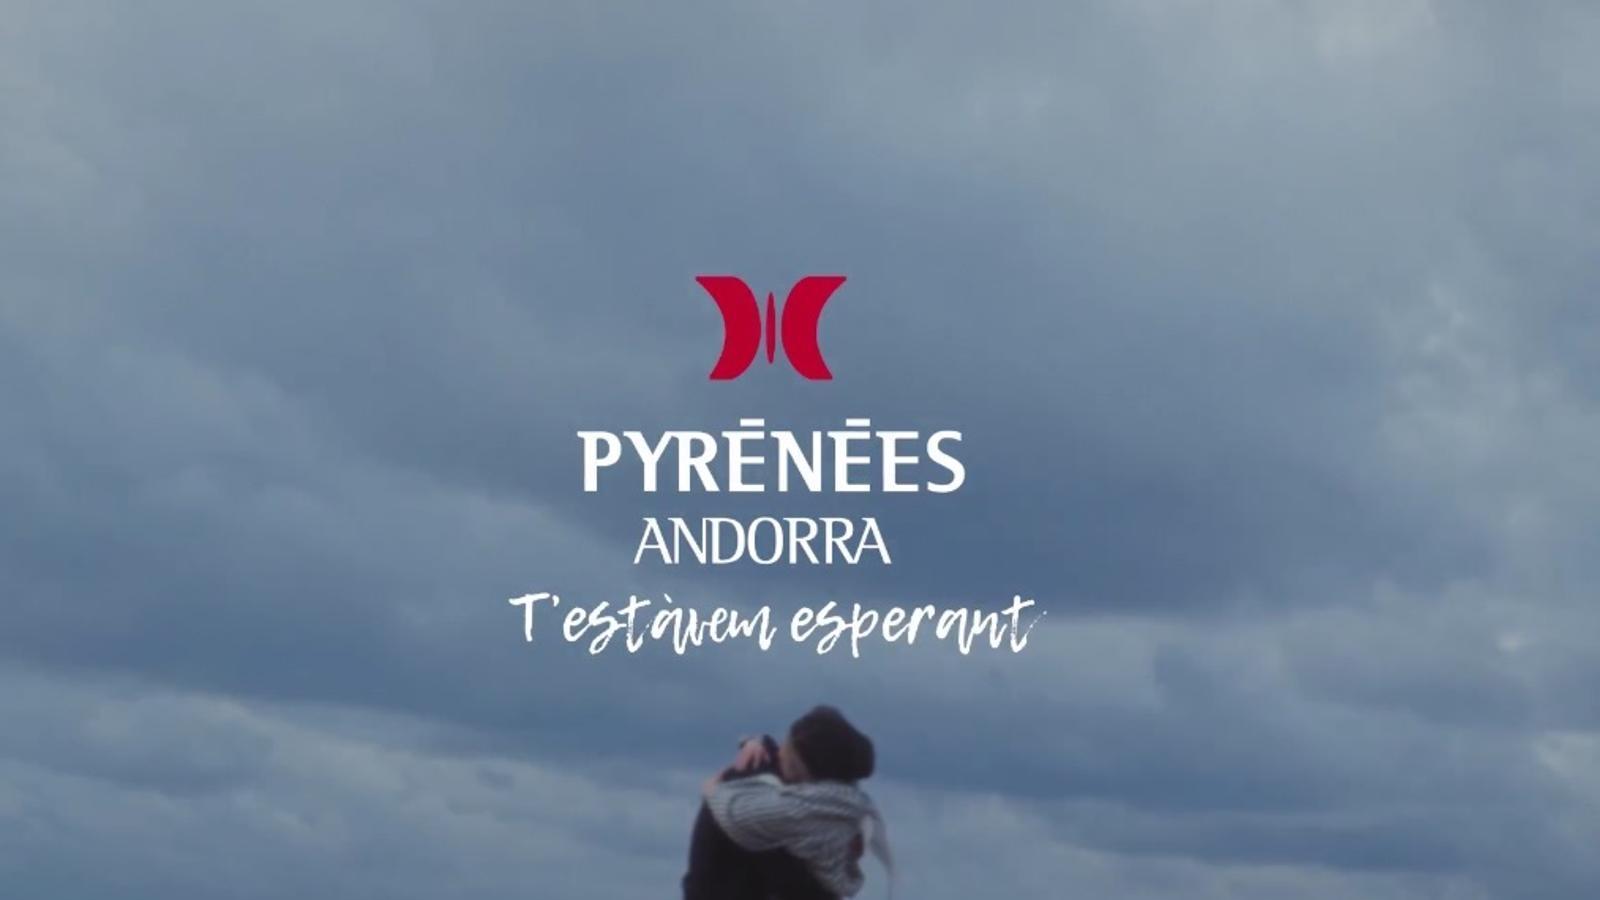 El viral que il·lusiona l'Andorra post-coronavirus. / PYRÉNÉES